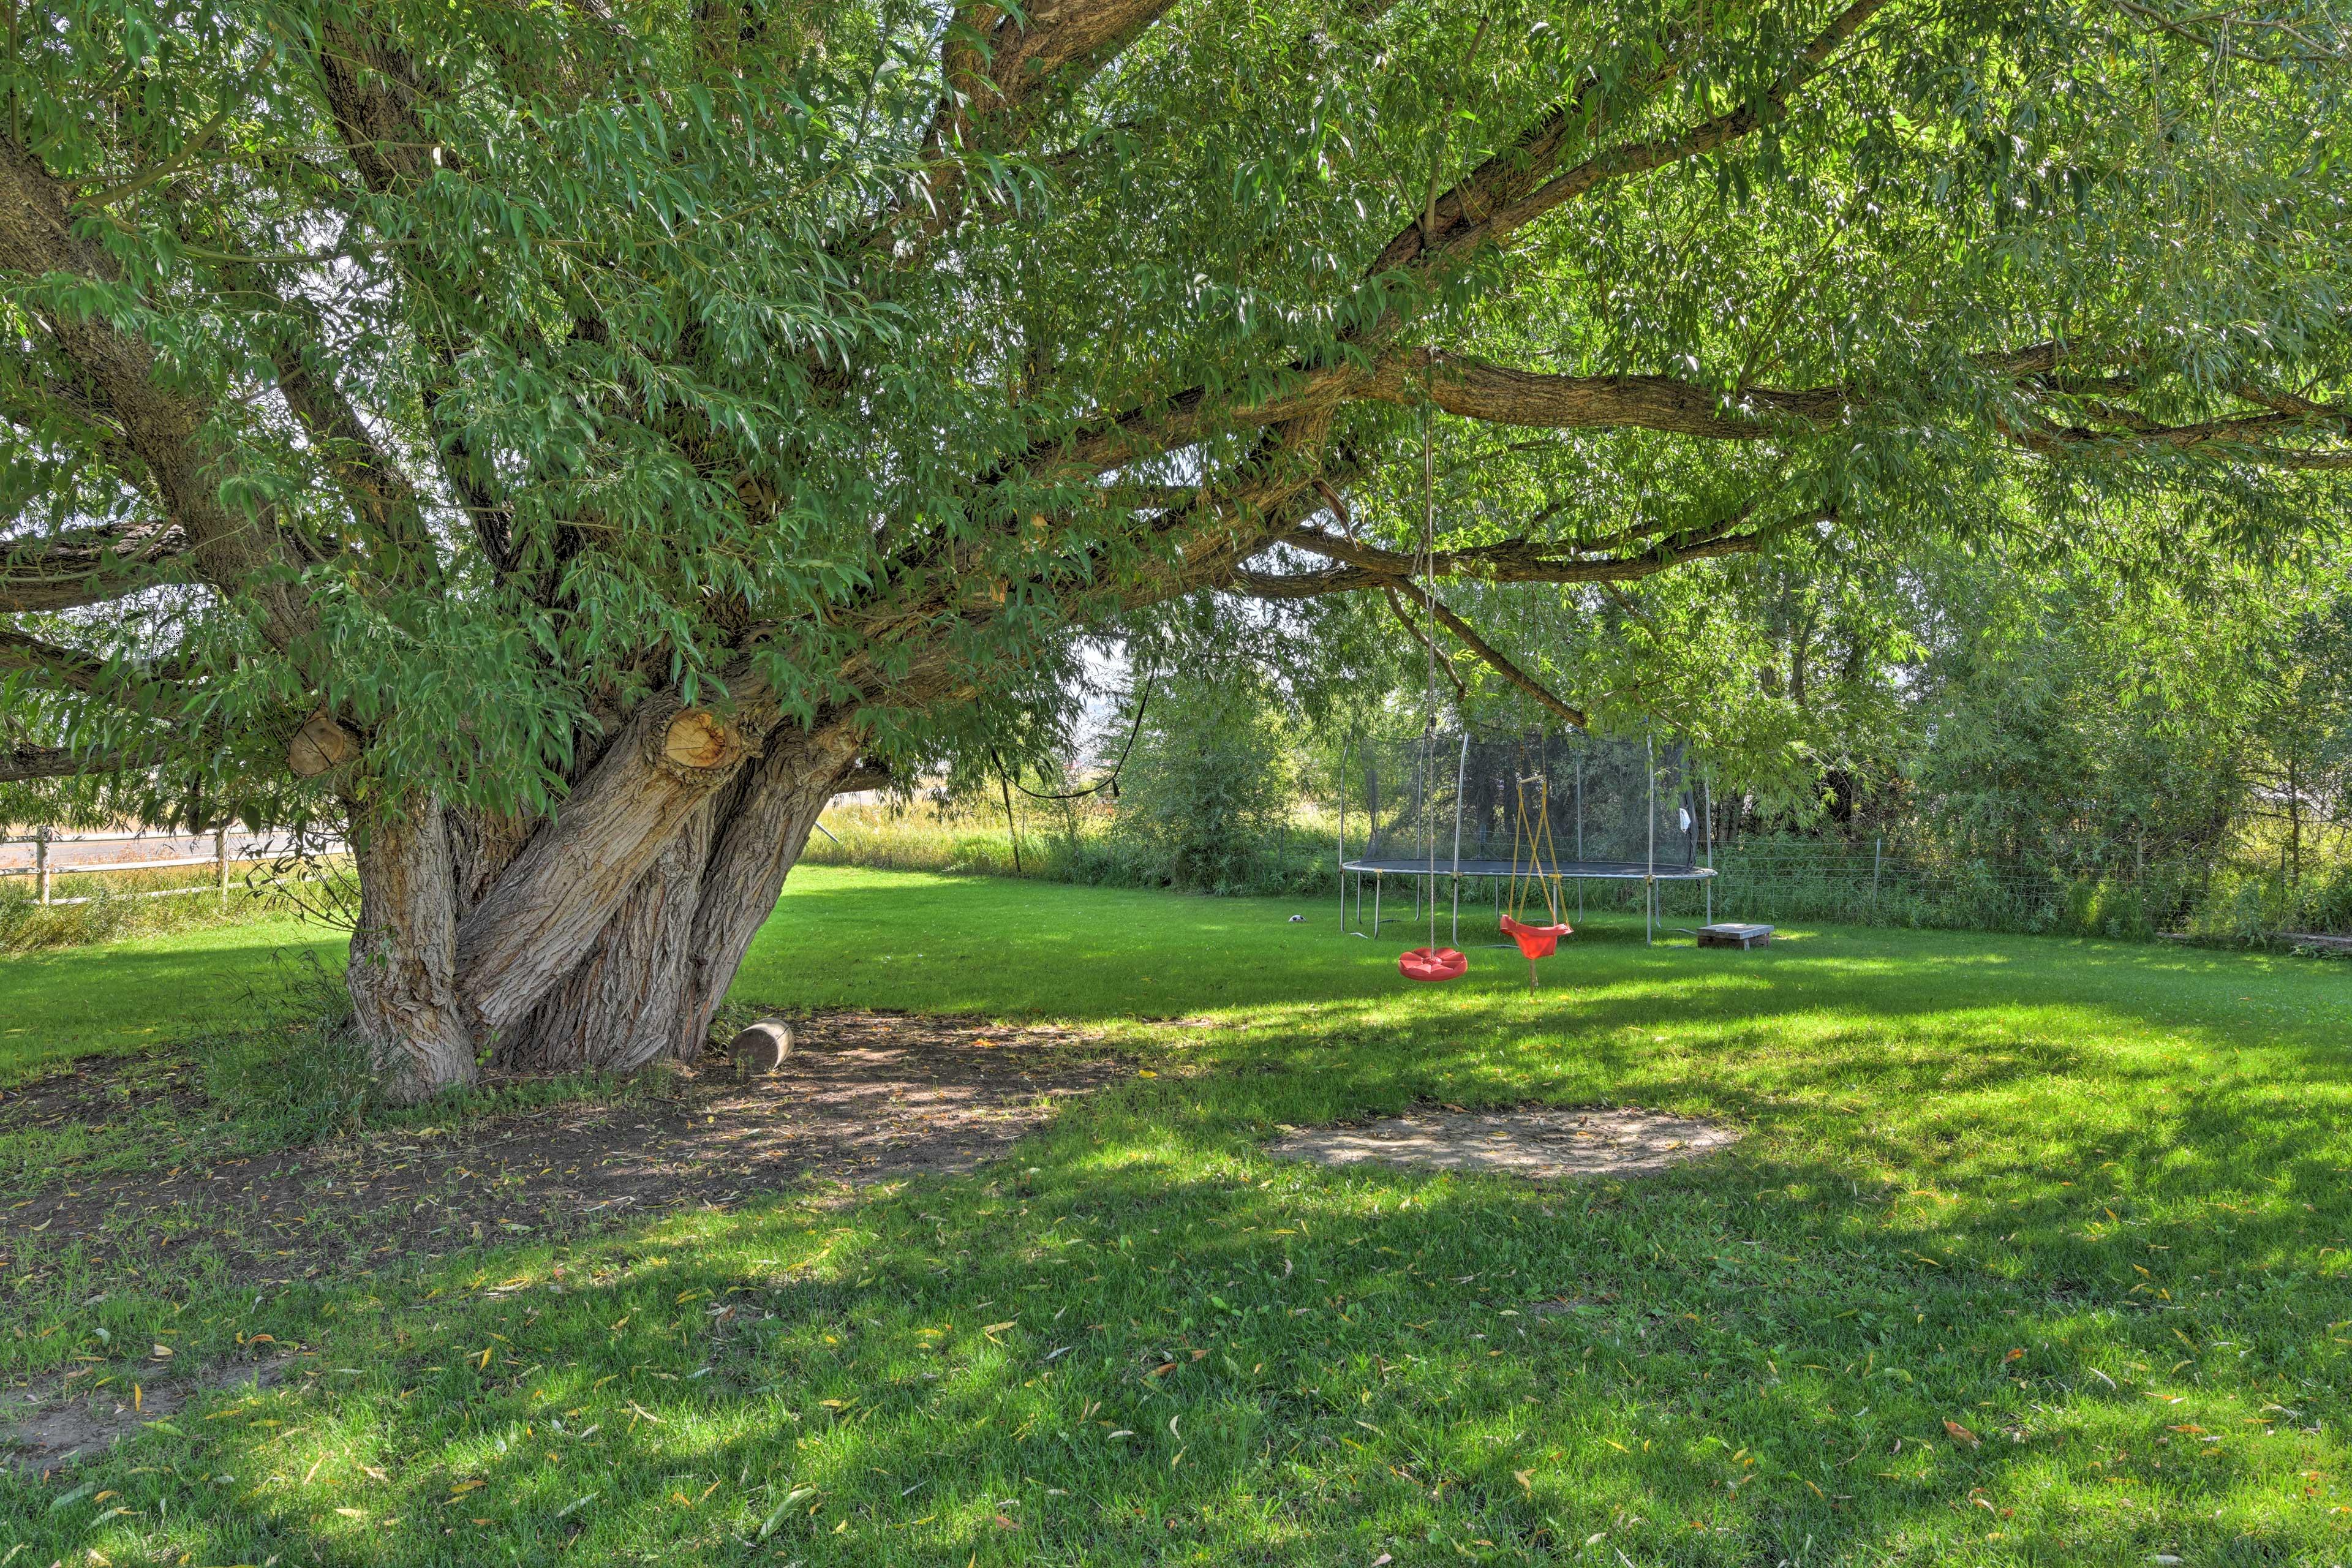 Private Yard | Children's Toys | Trampoline